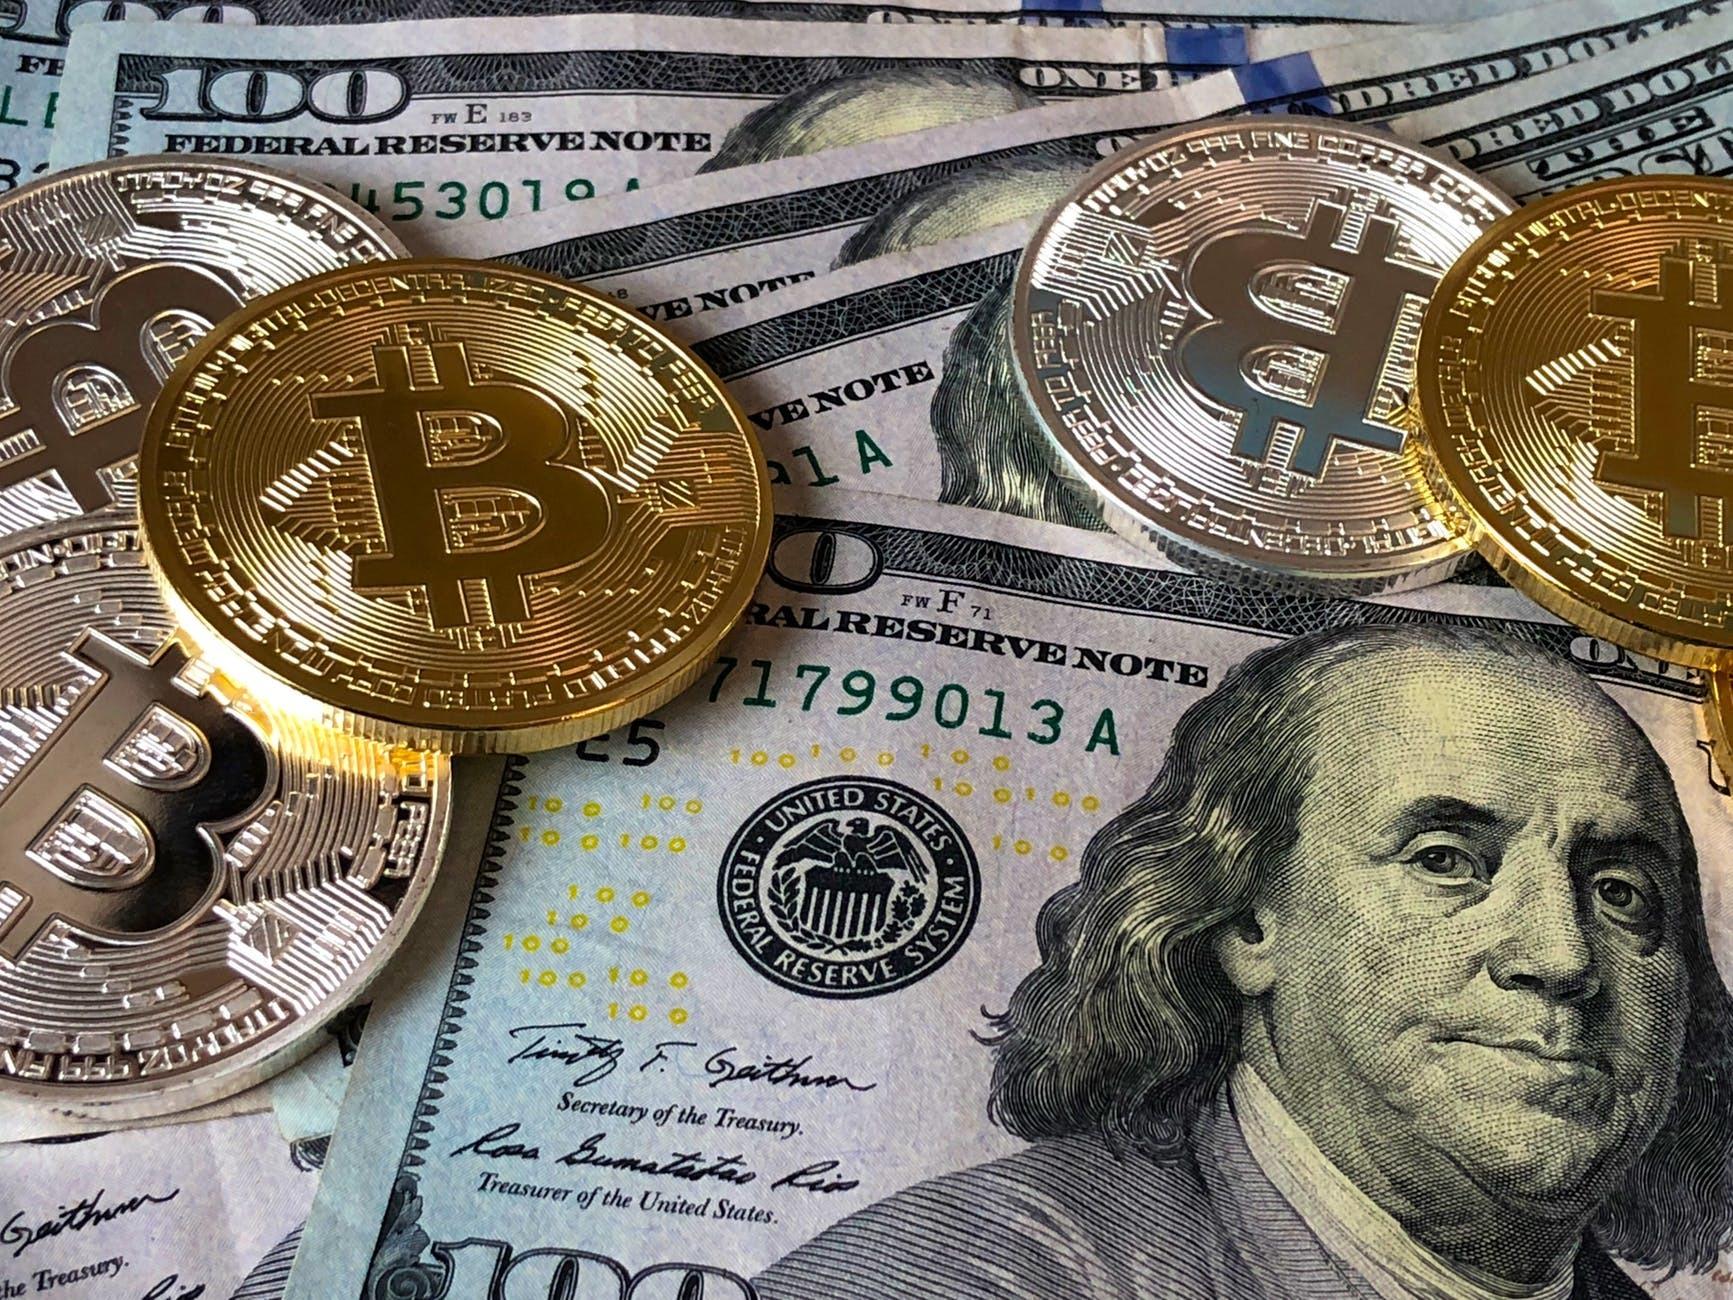 lista proprietarilor bitcoin iphone bitcoin trader